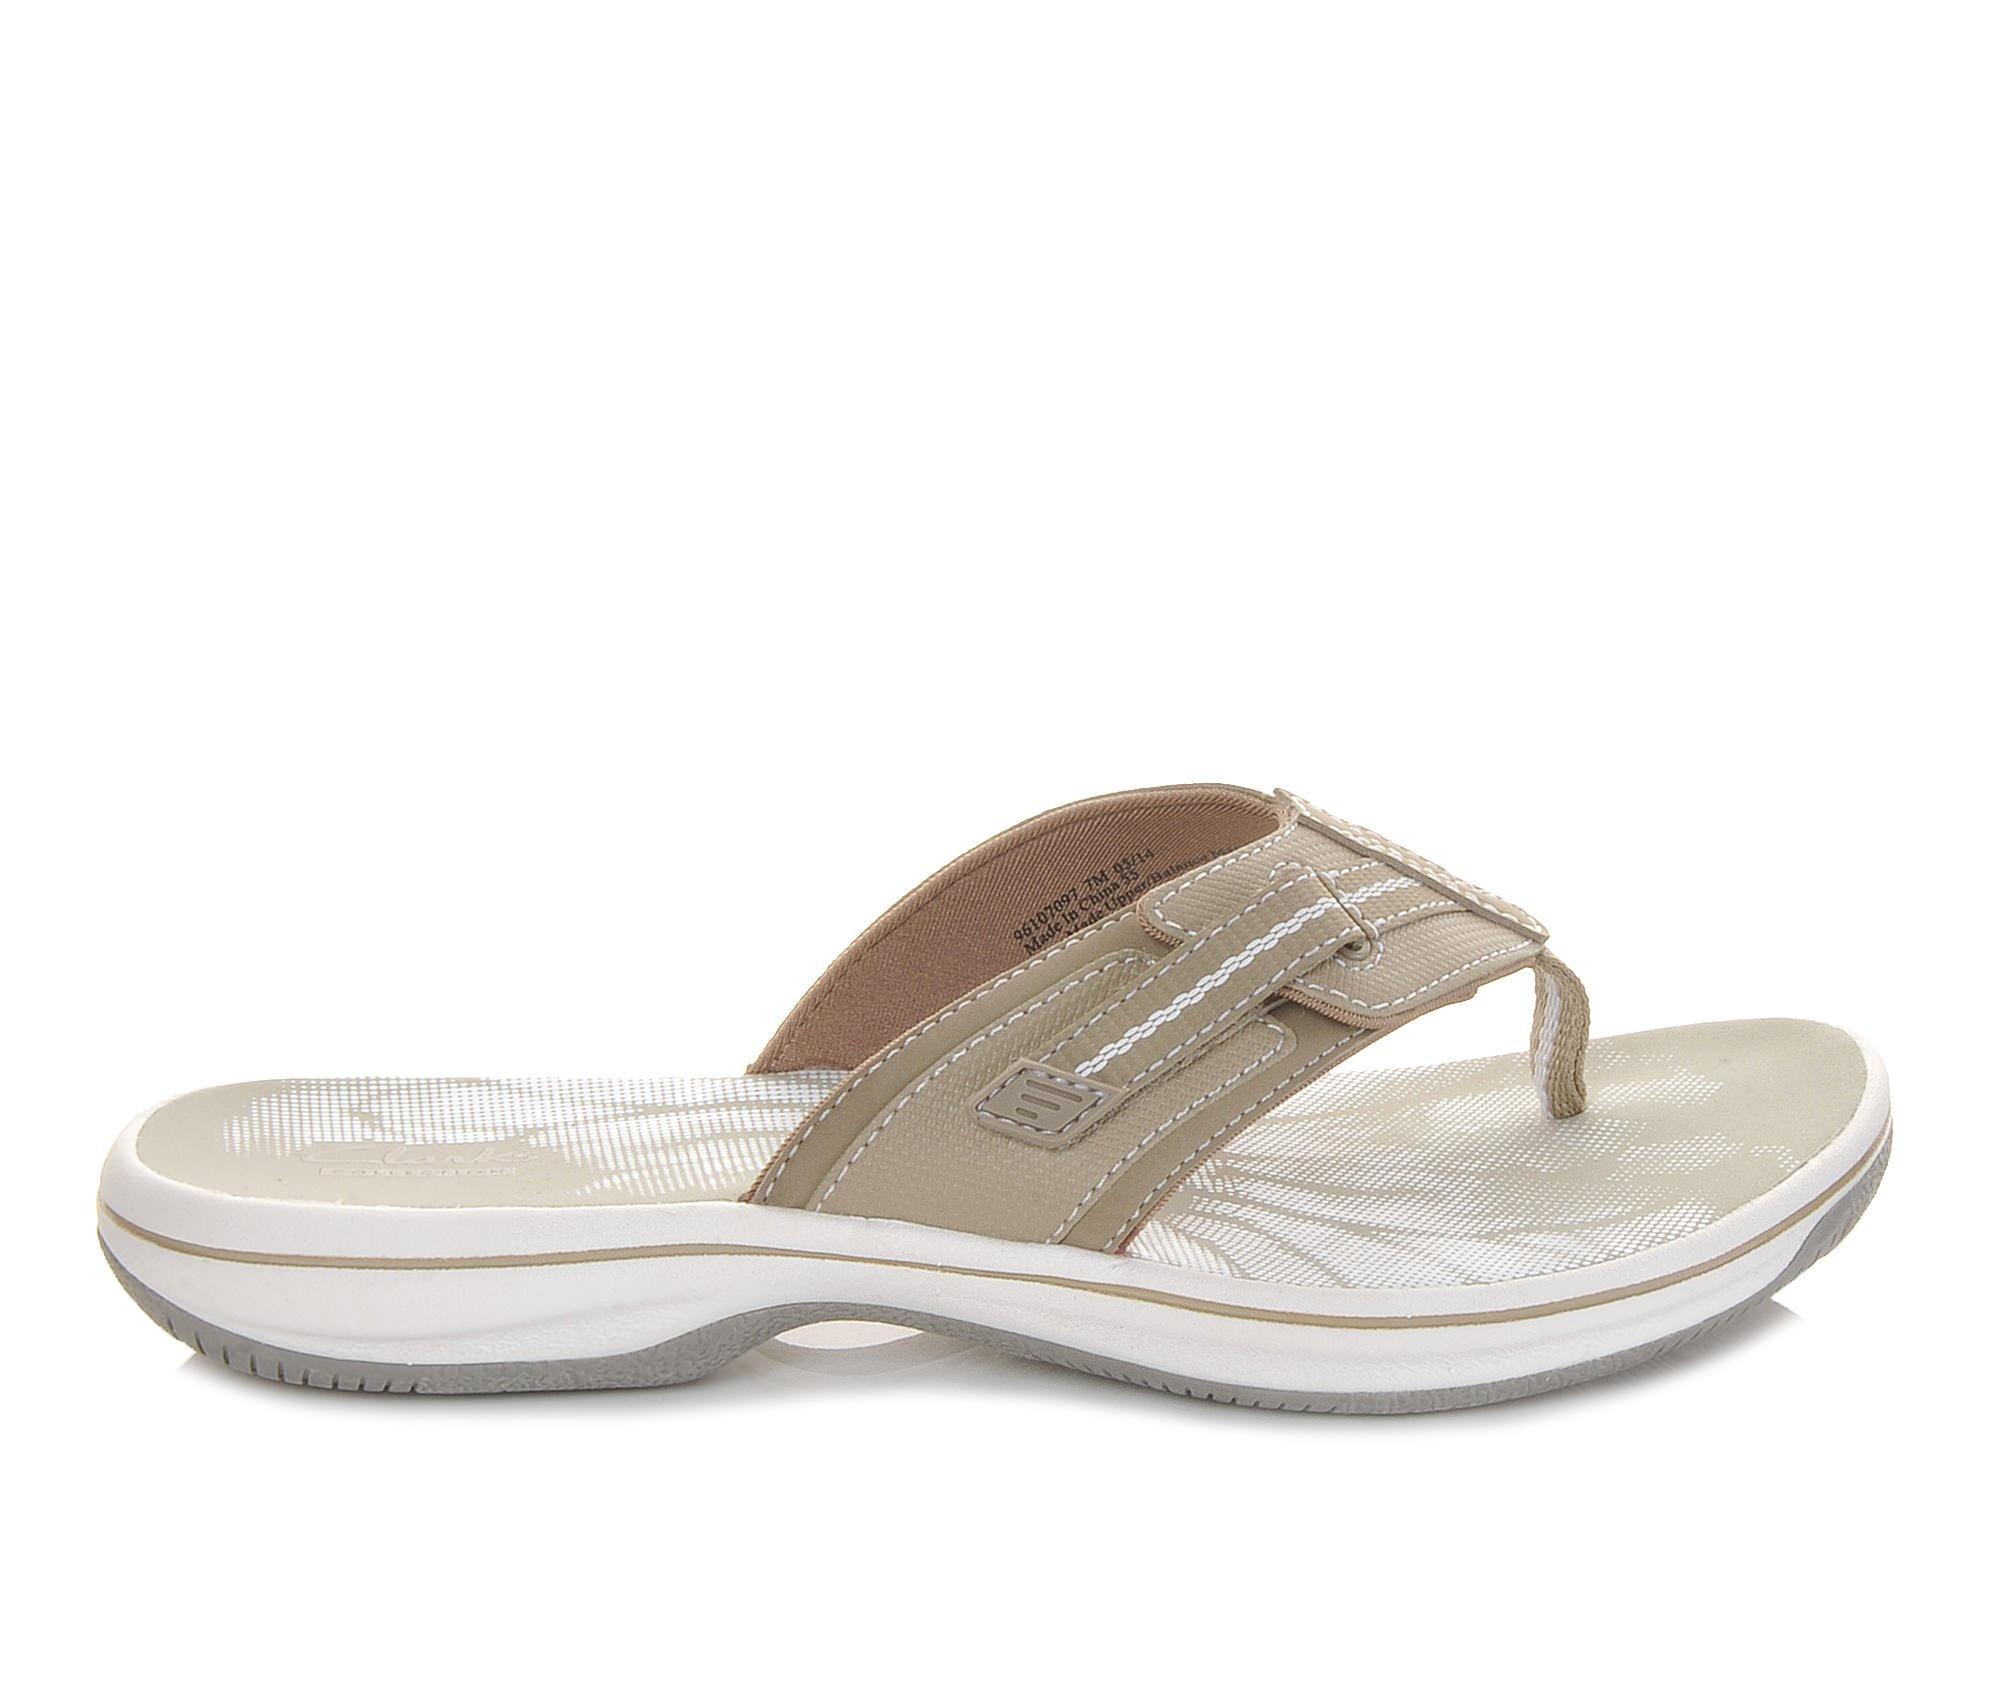 Women's Clarks Brinkley Jazz Sandals (Beige)